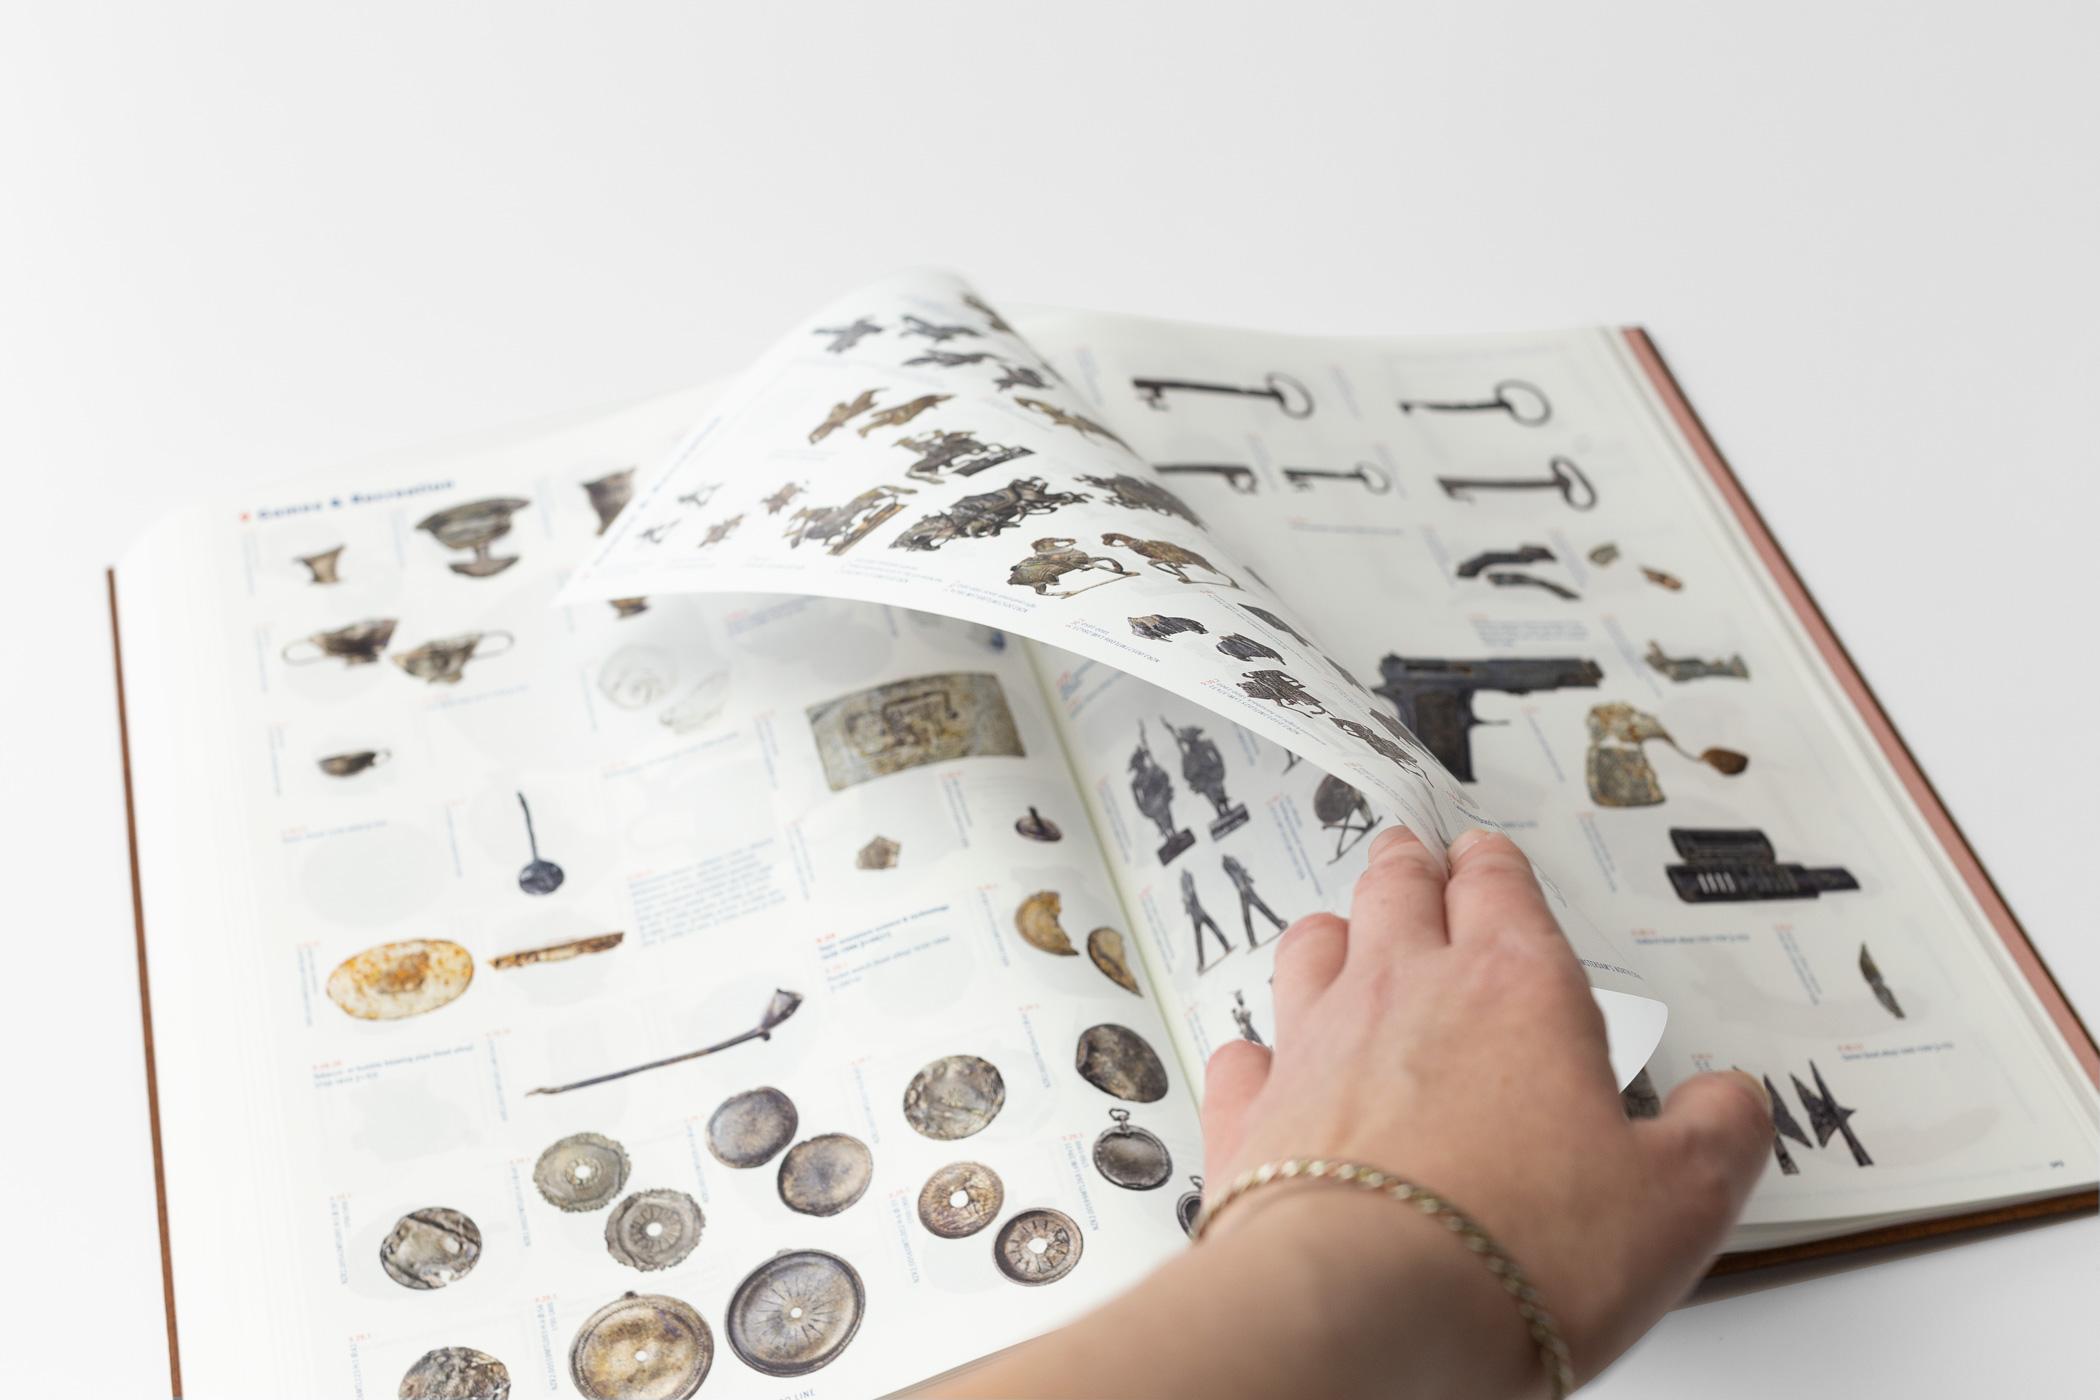 Spul boek Binnenwerk: Schutpapier 72 g/m2, van Schutpapier